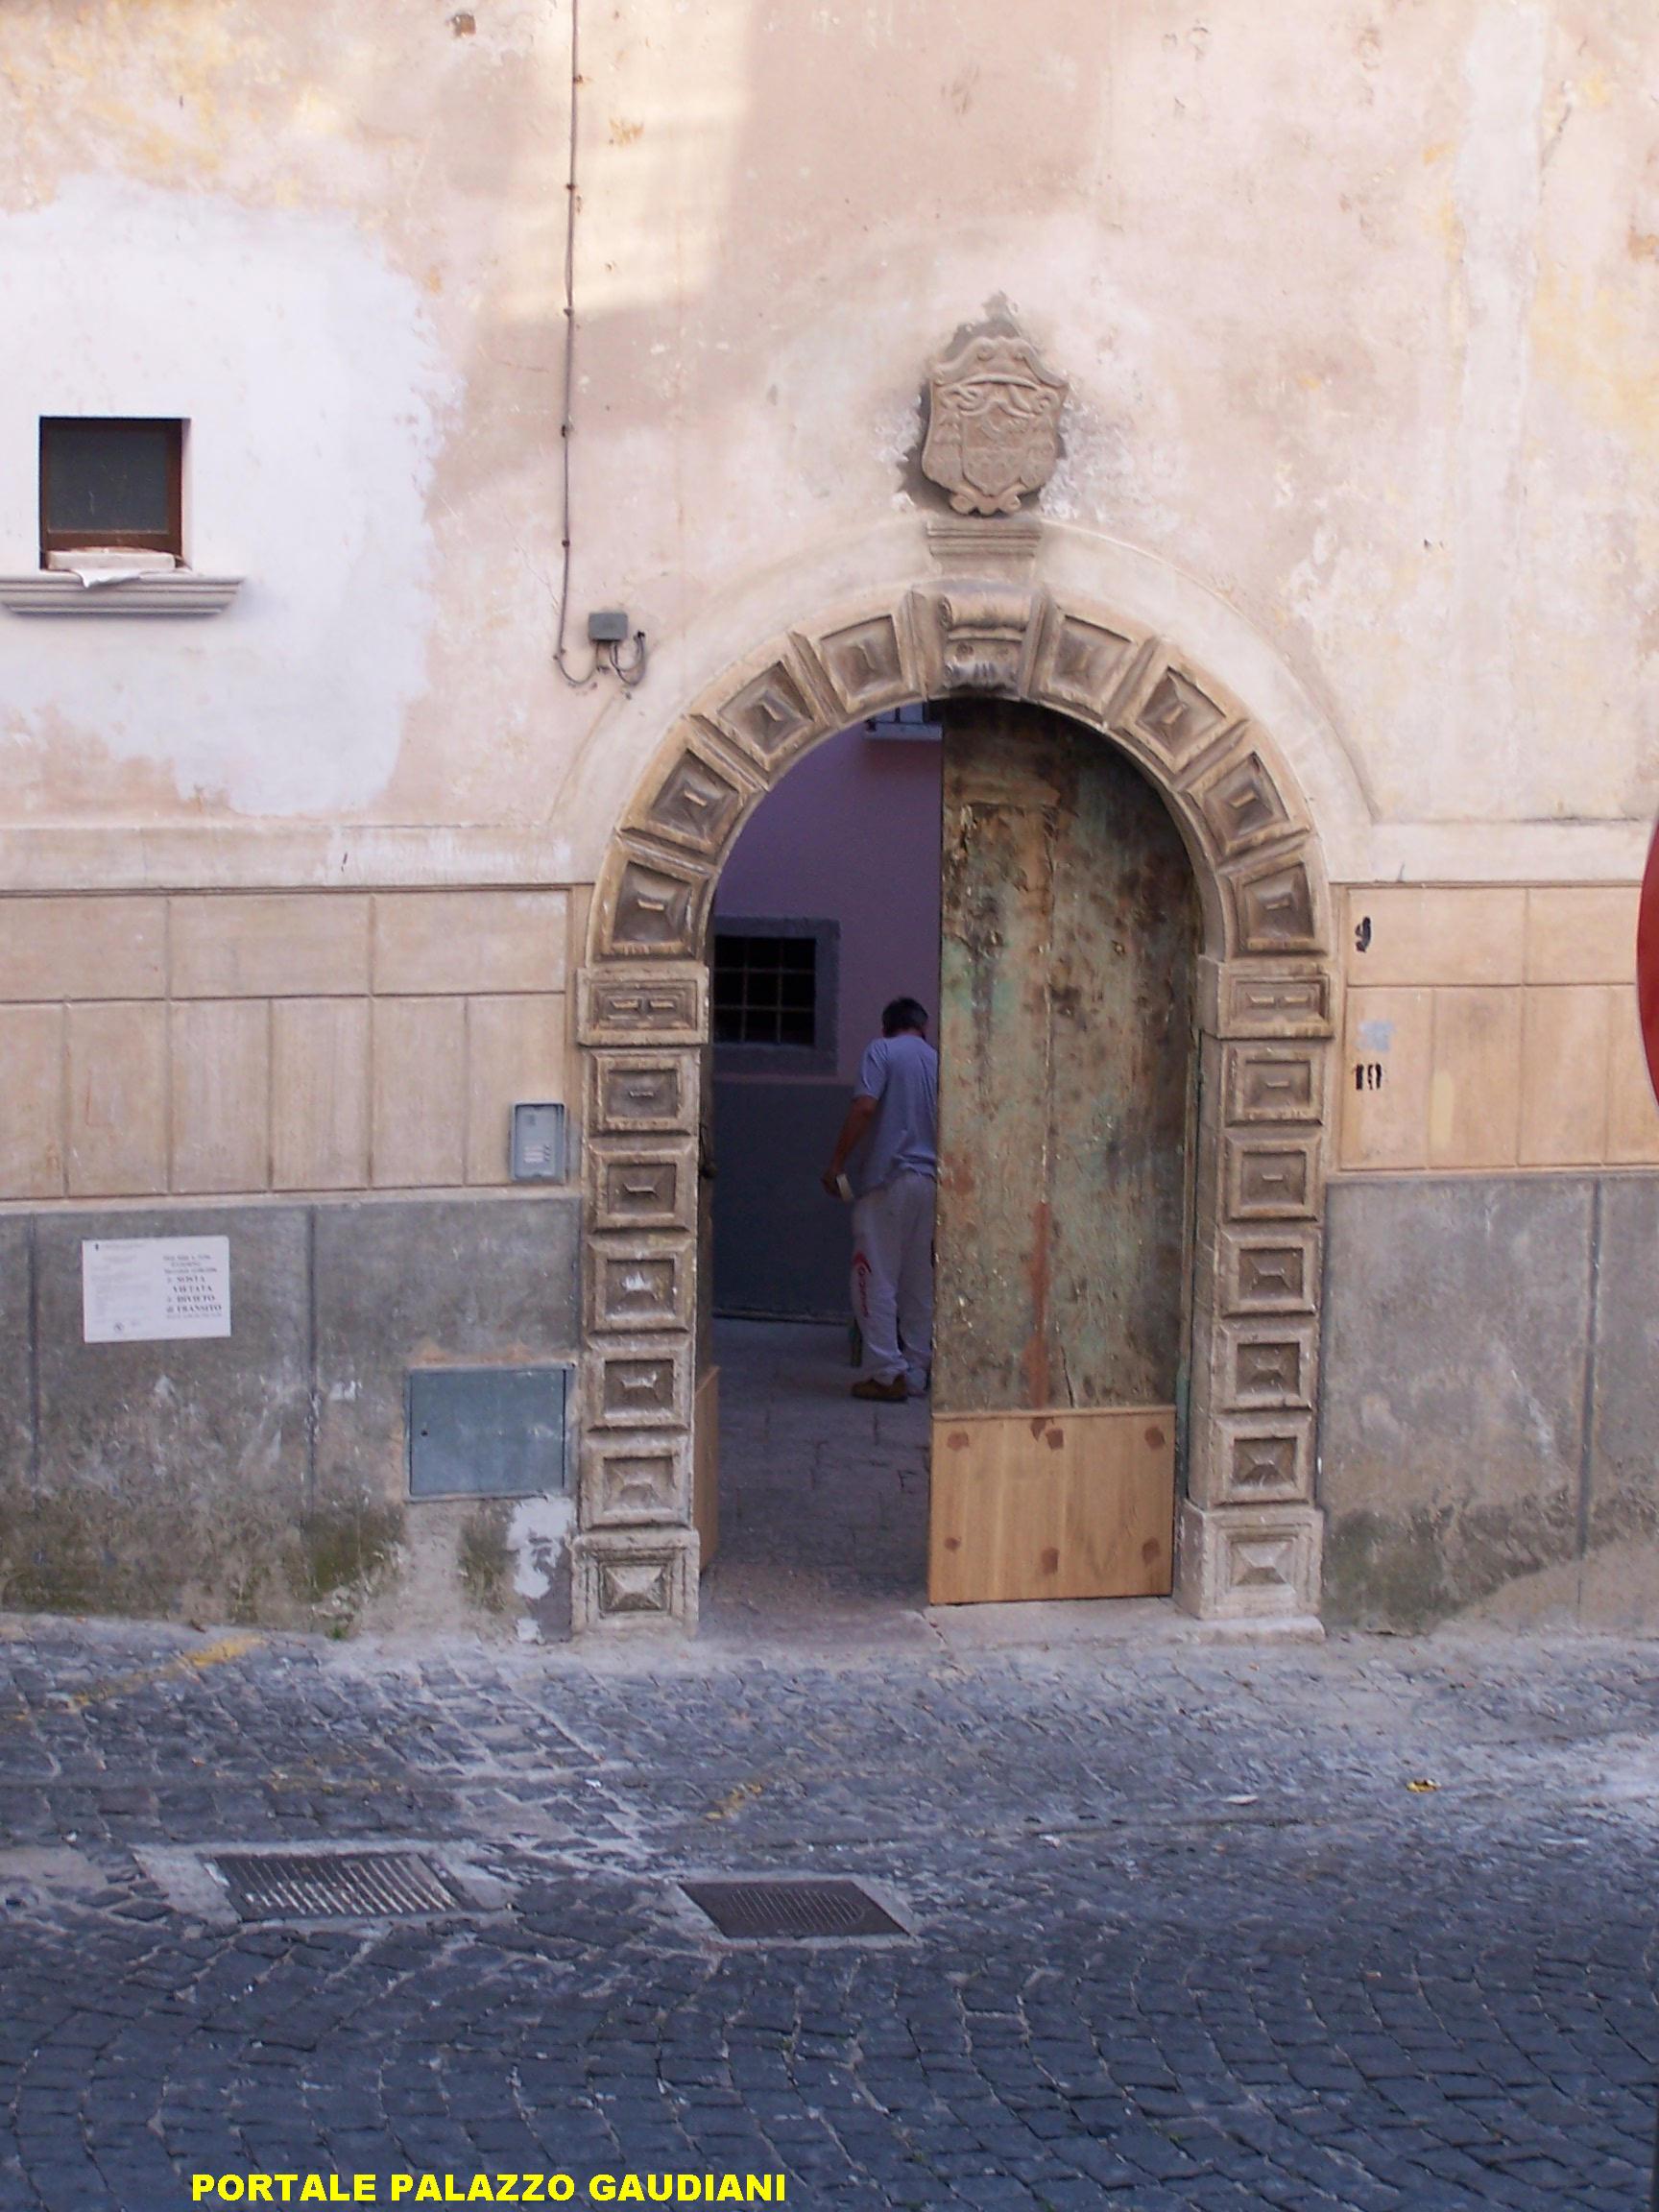 Portale palazzo ex Gaudiani (L.go Mariano Gaudiani)